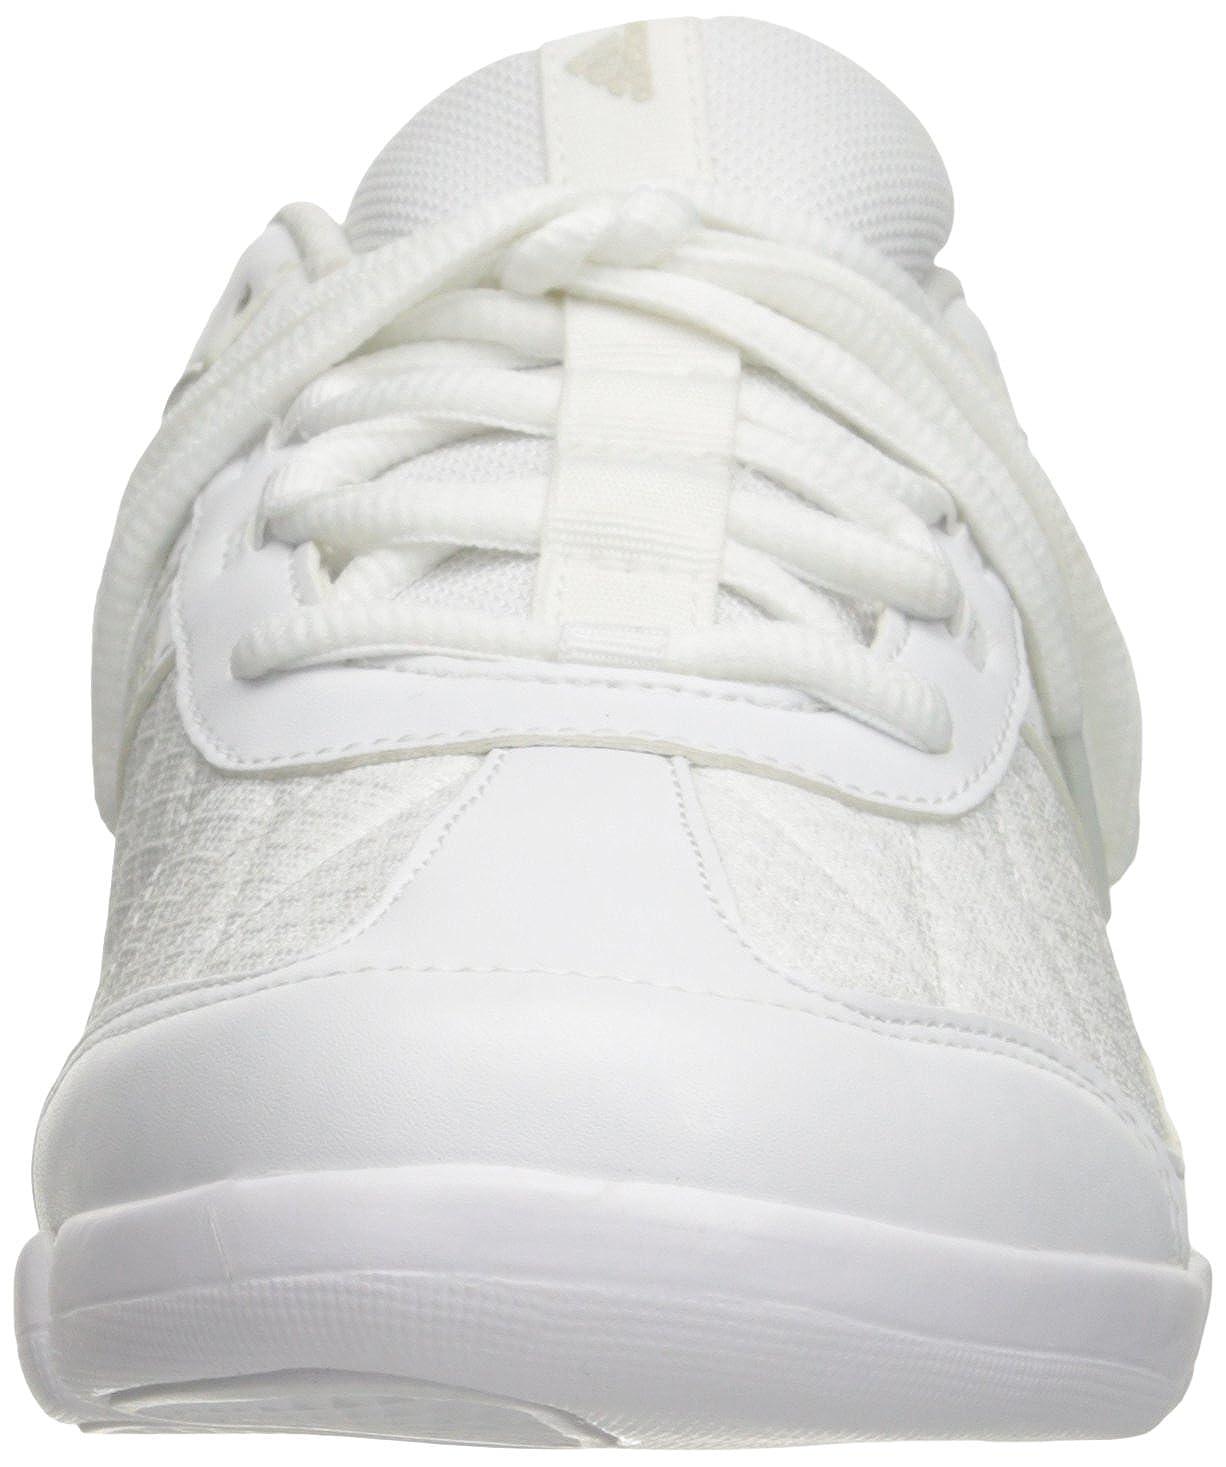 Triple Schuhe Granite Woherren Cheer Adidas Grau Weiß Performance MSUqpVz